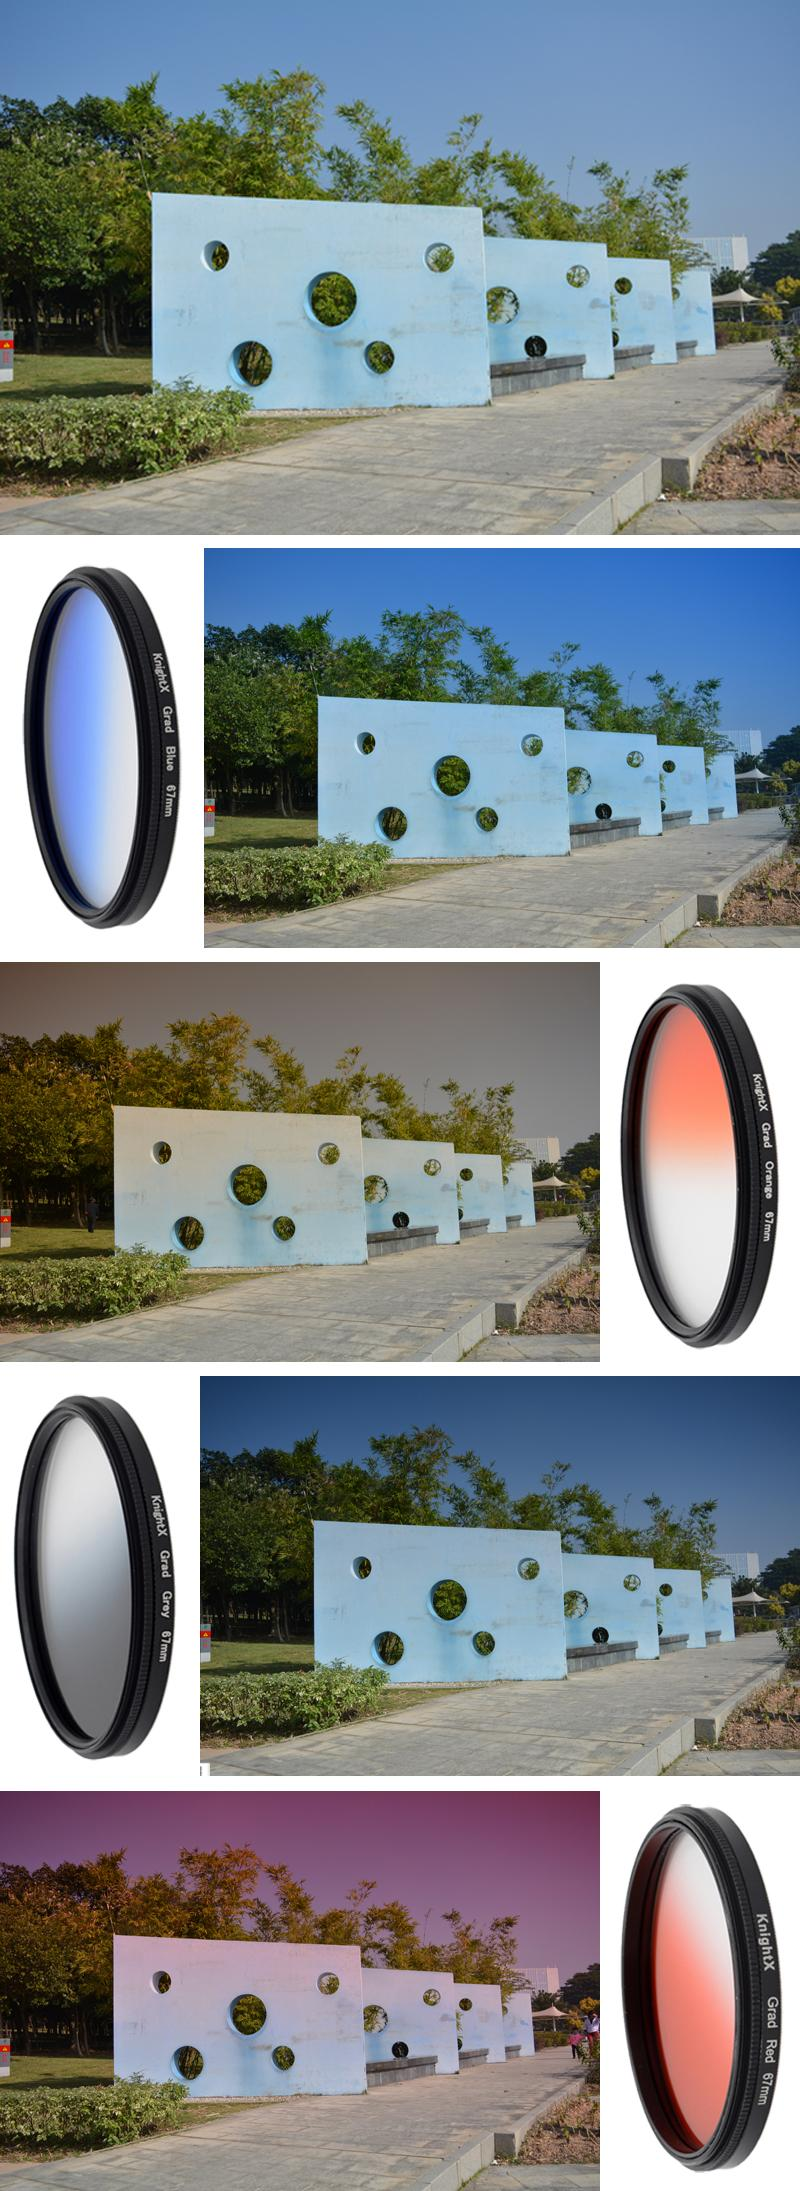 KnightX 52mm 58MM 67MM Graduated Color ND CPL UV Lens Filter Kit for Nikon canon D5100 D3300 D5300 D50 D3100 D30 SLR Camera 7